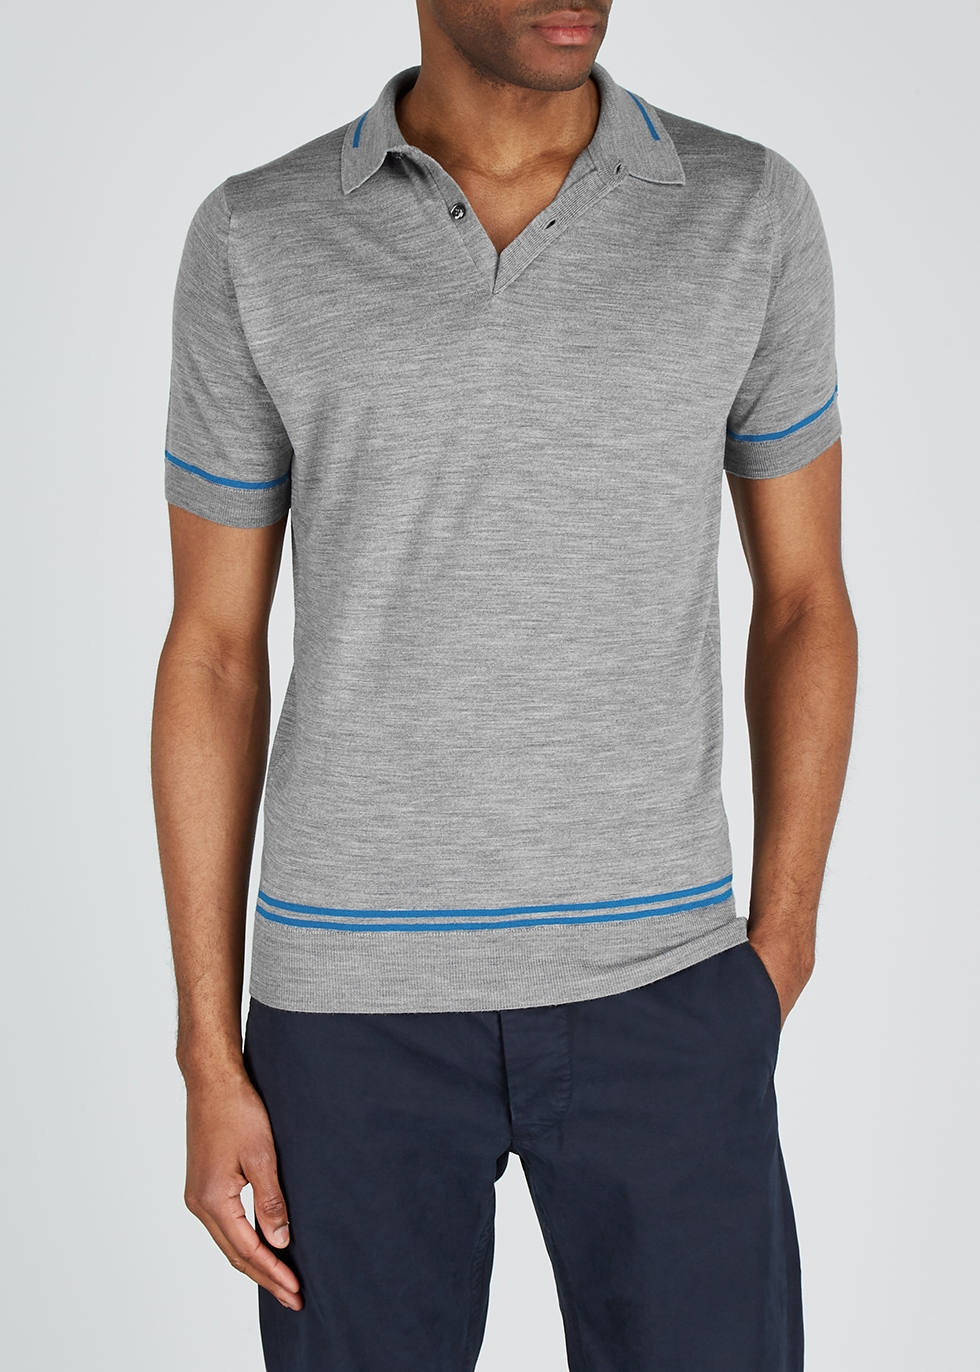 Beekroft grey wool polo shirt - John Smedley